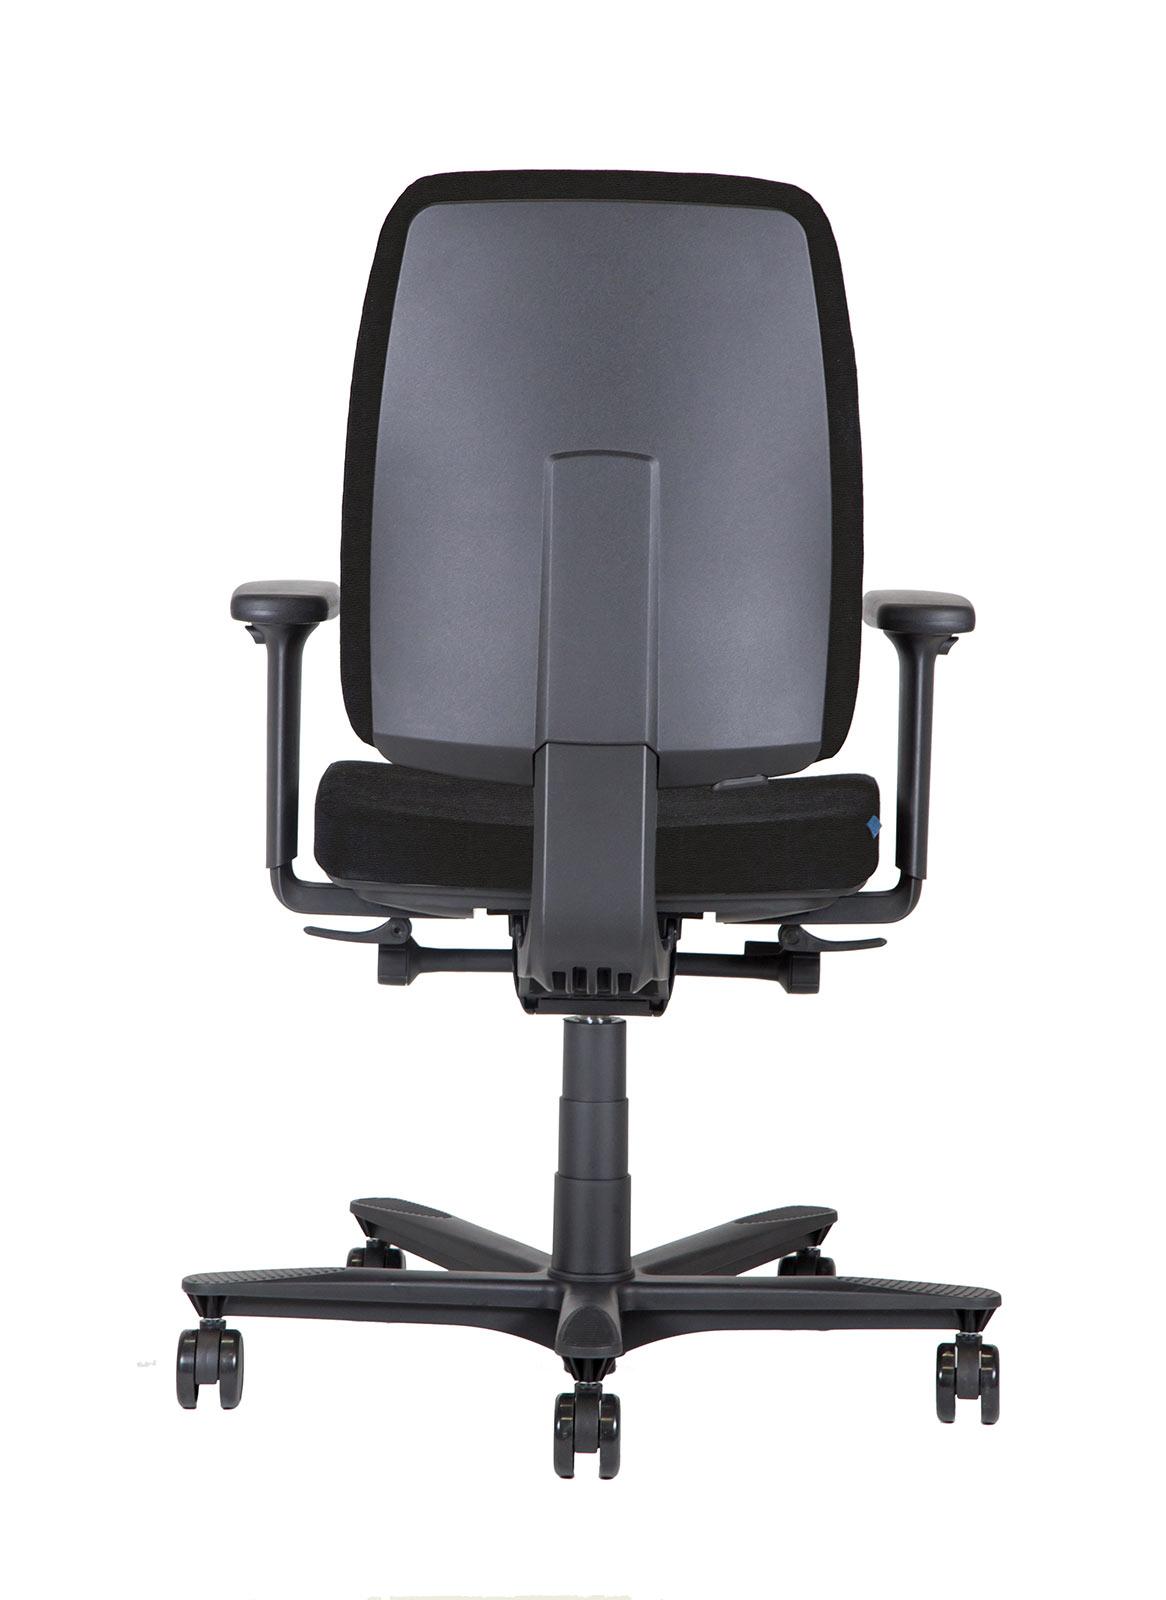 BB122 Sedia ufficio ergonomica Retro_nero